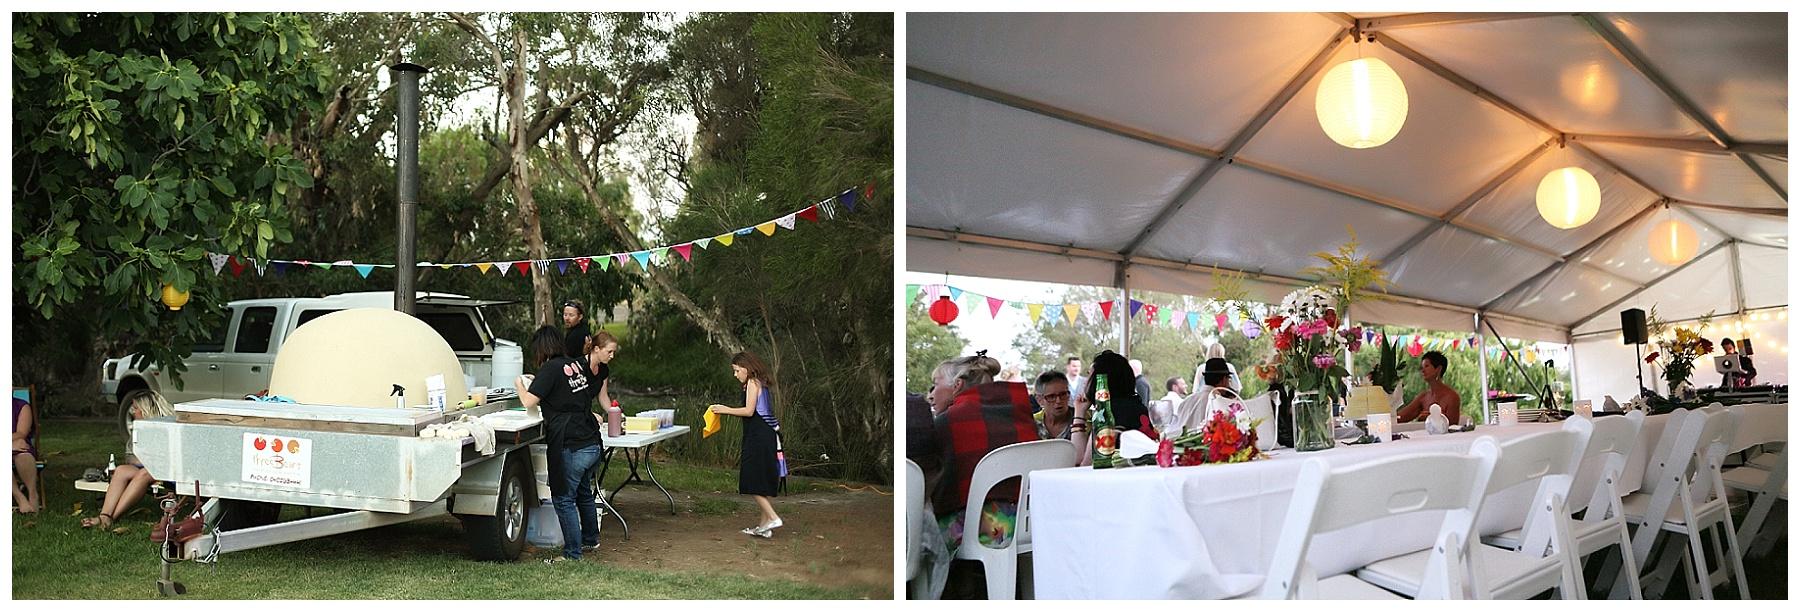 Backyard Wedding Perth 07.jpg